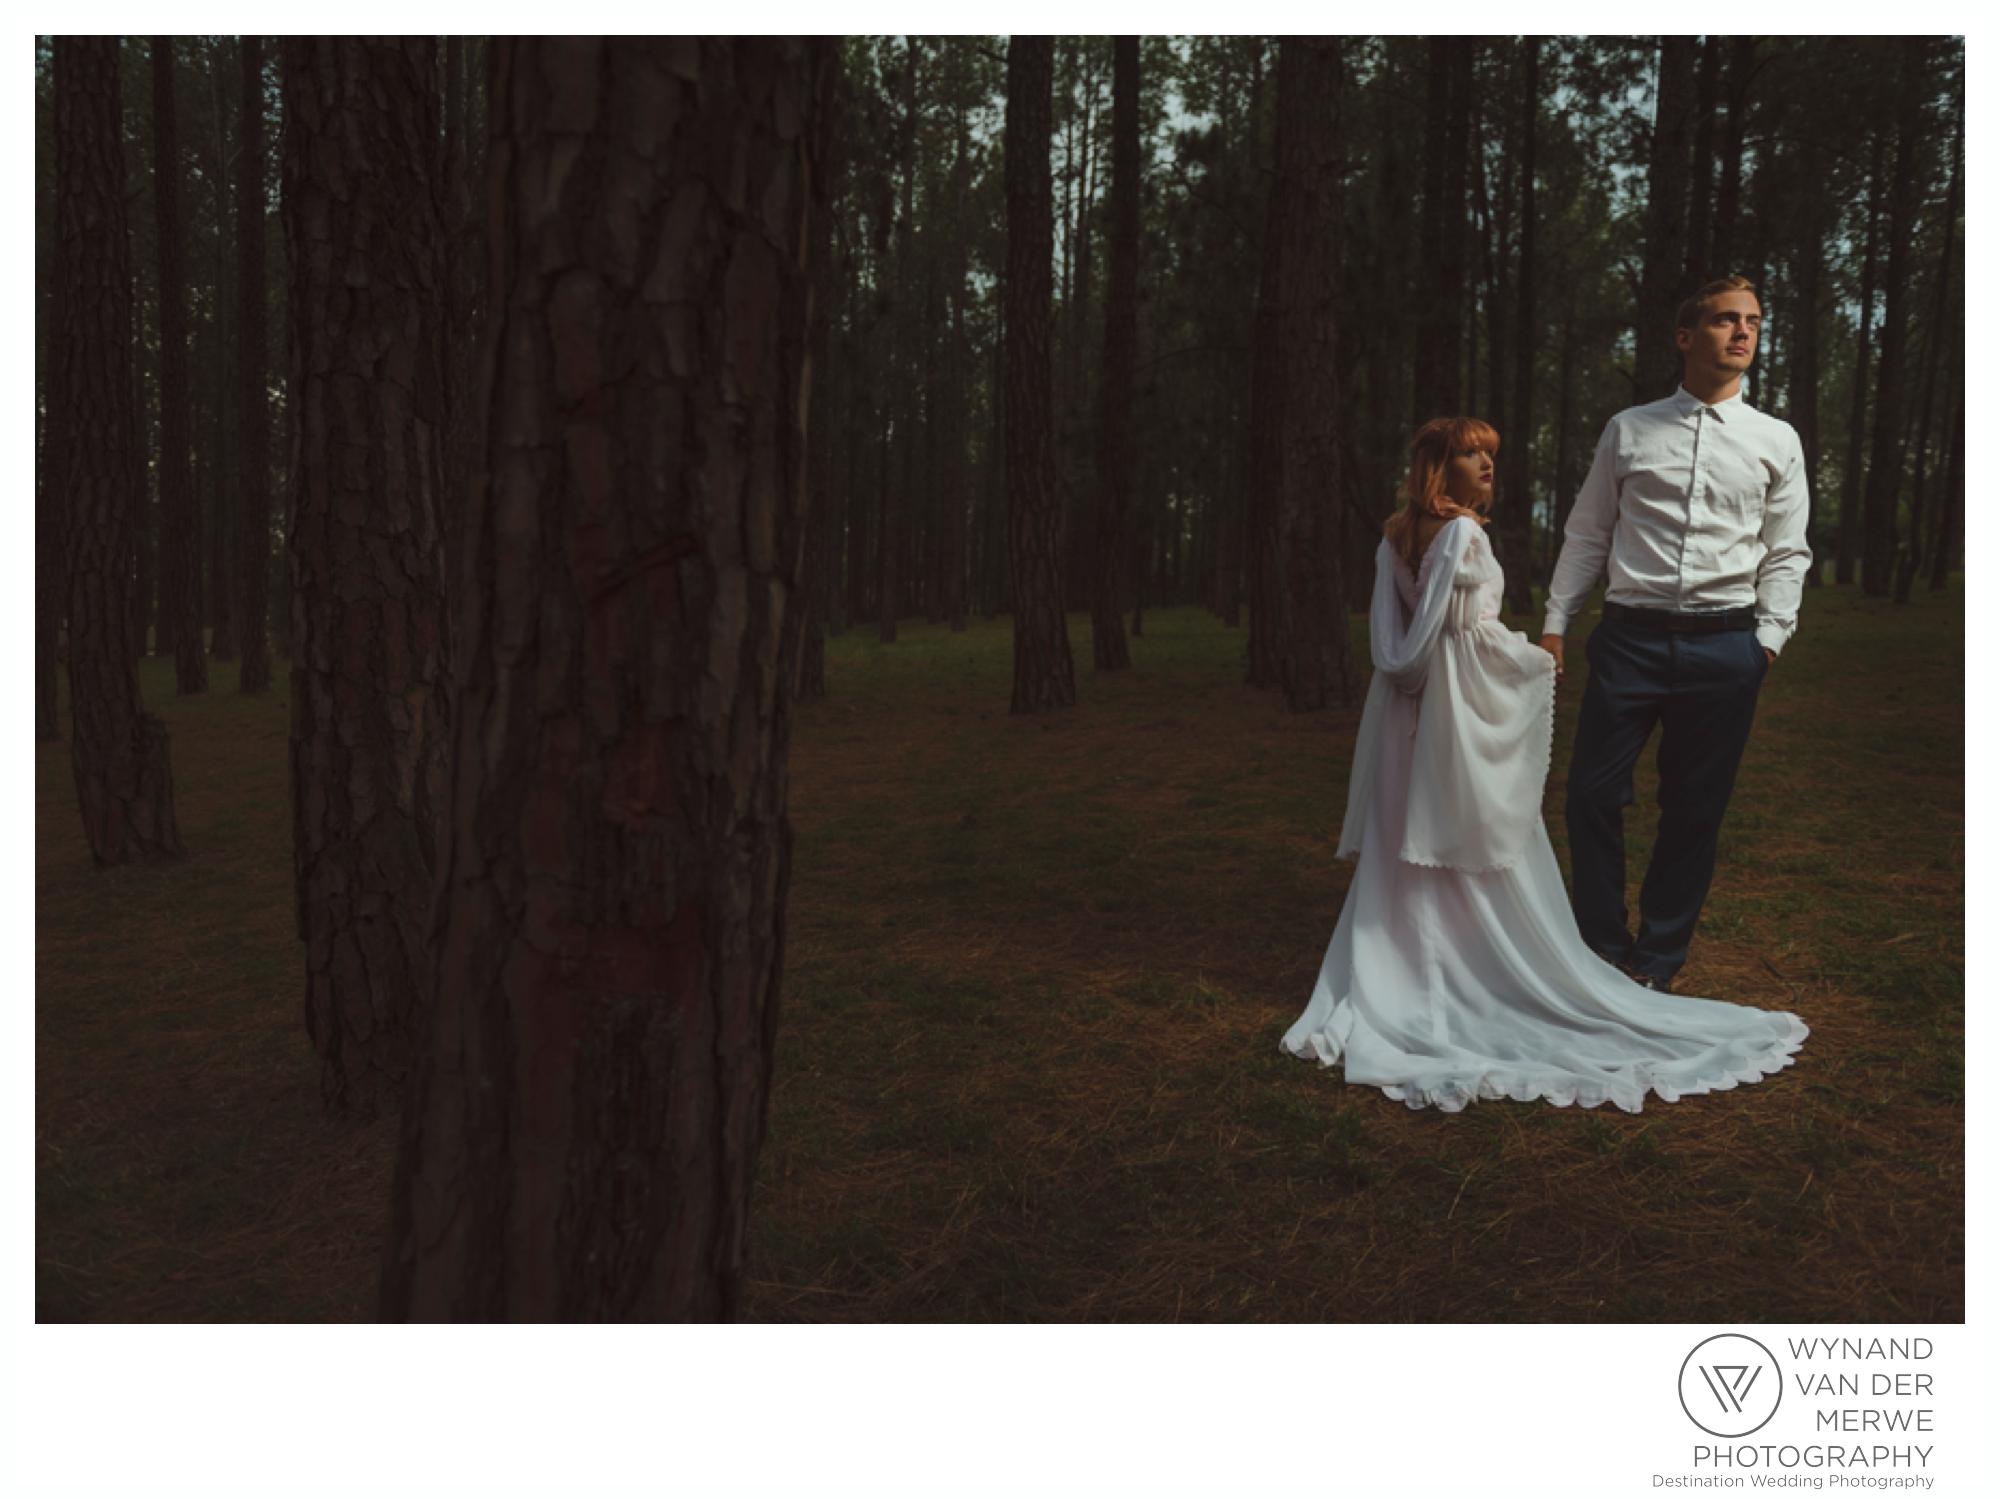 Engaged couple photography session